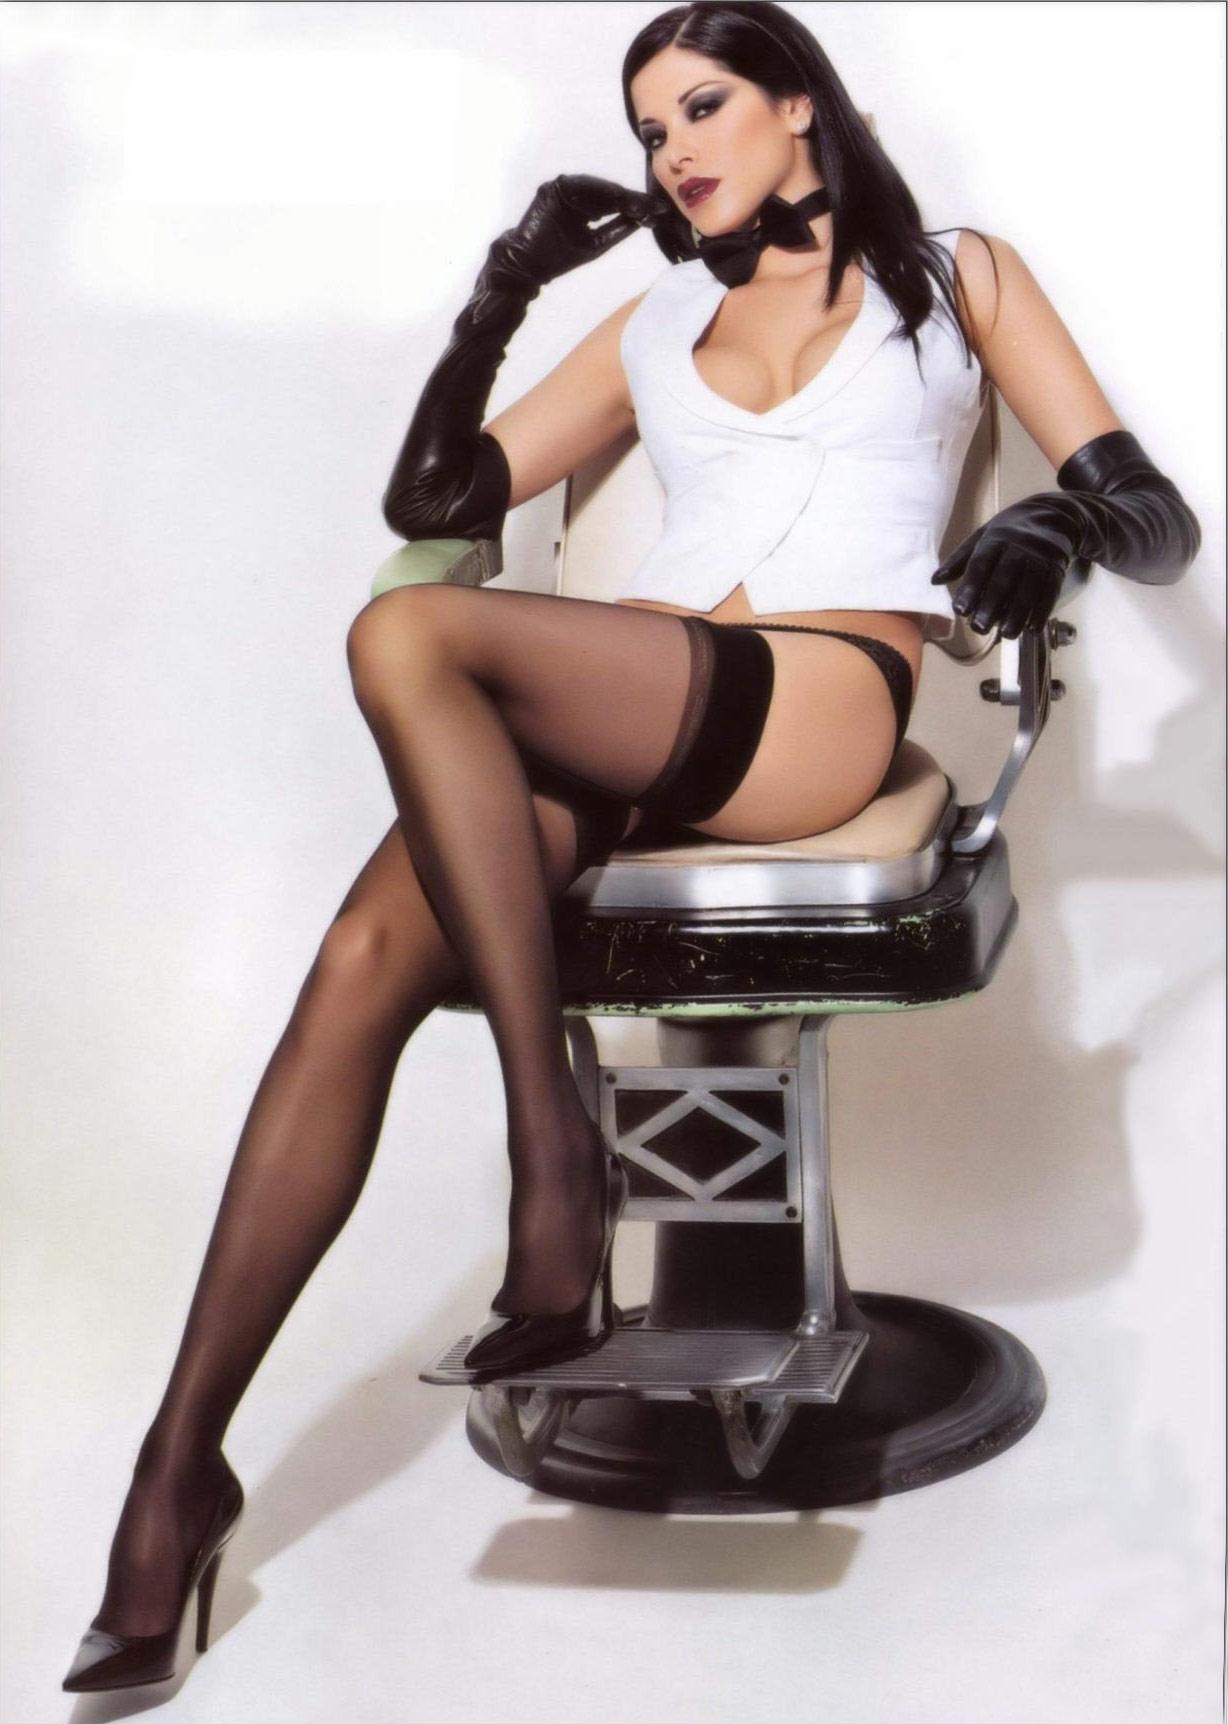 Aida Yespica Sexy Hot